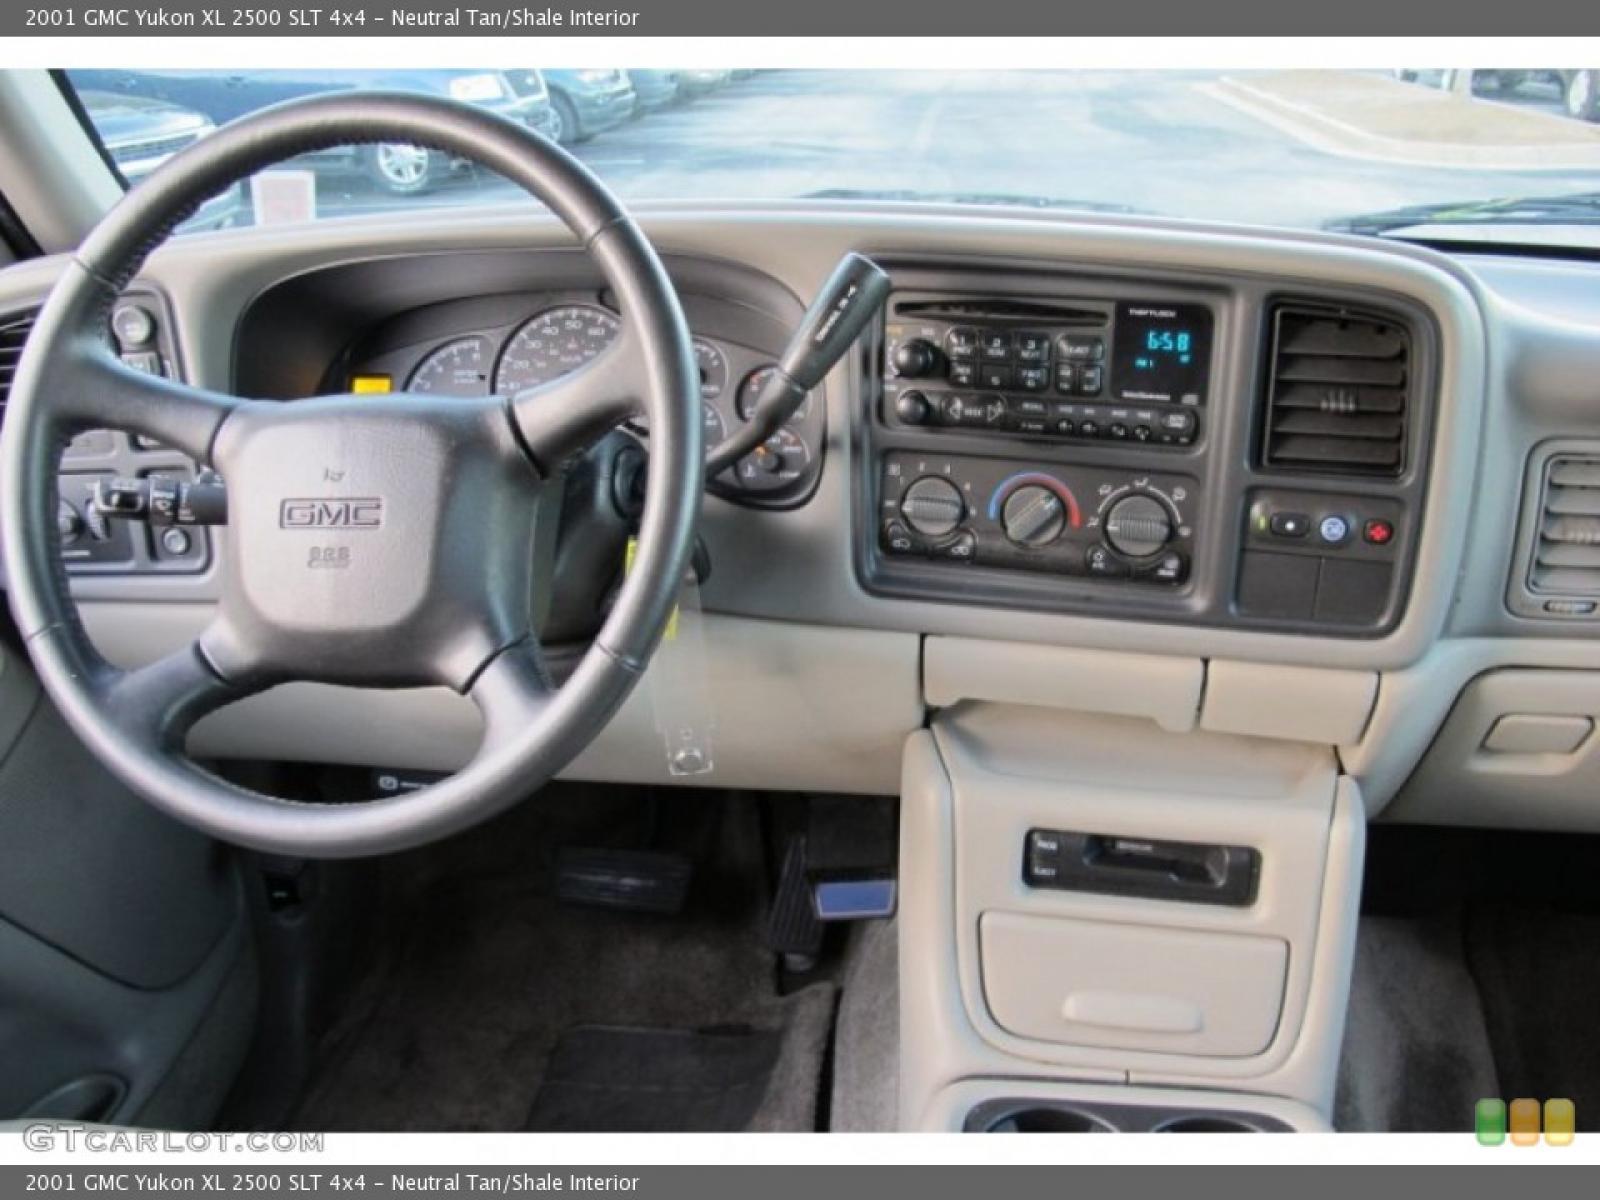 2001 gmc yukon information and photos zombiedrive Yukon Denali XL Limo Interior 800 1024 1280 1600 origin 2001 gmc